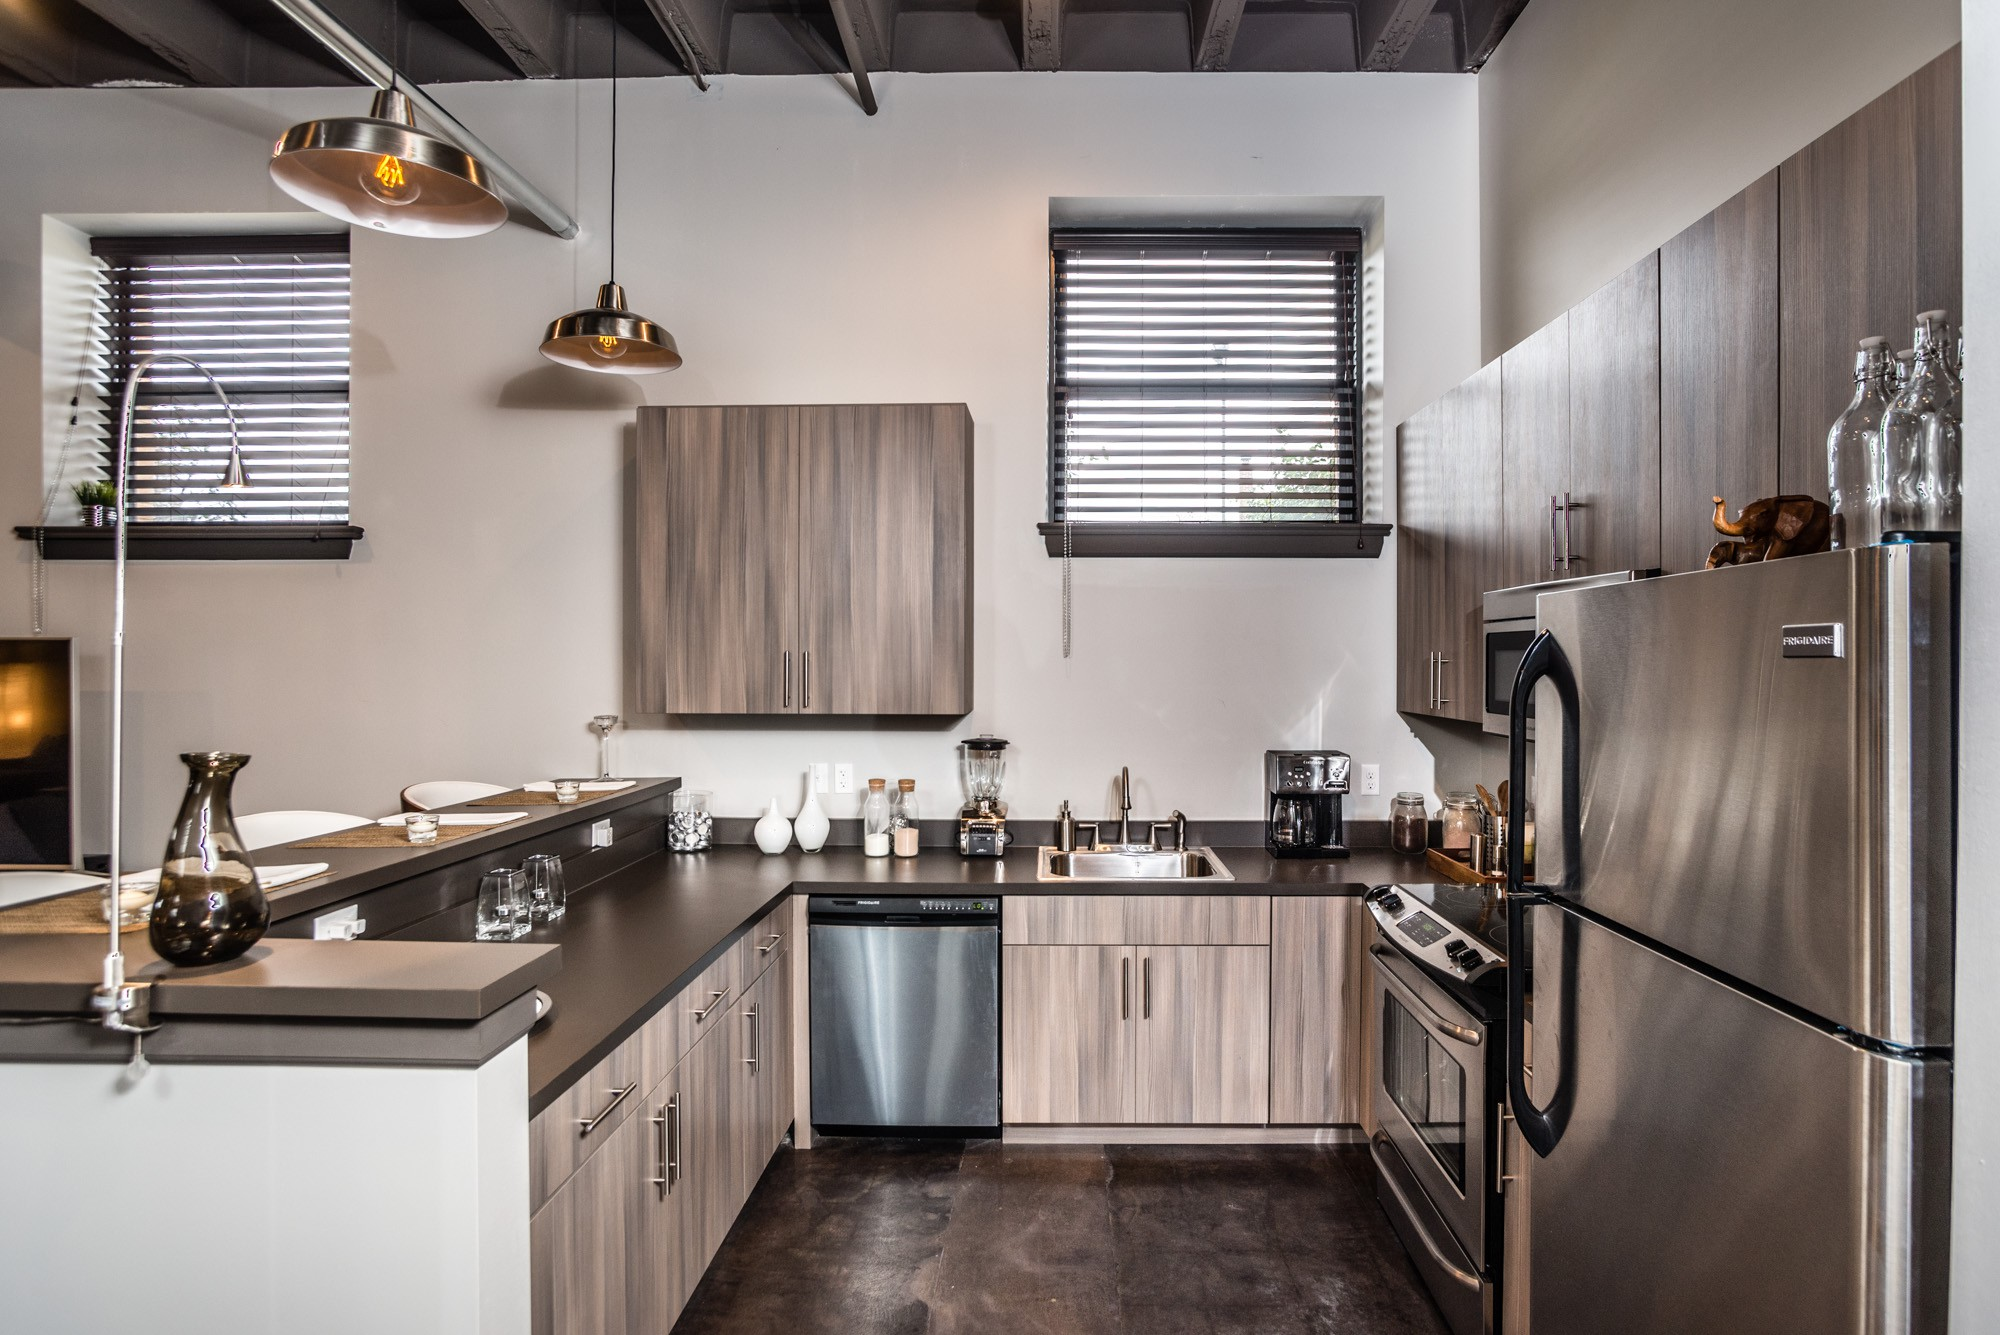 Apartments Near Logan Mack Lofts for Logan University Students in Chesterfield, MO